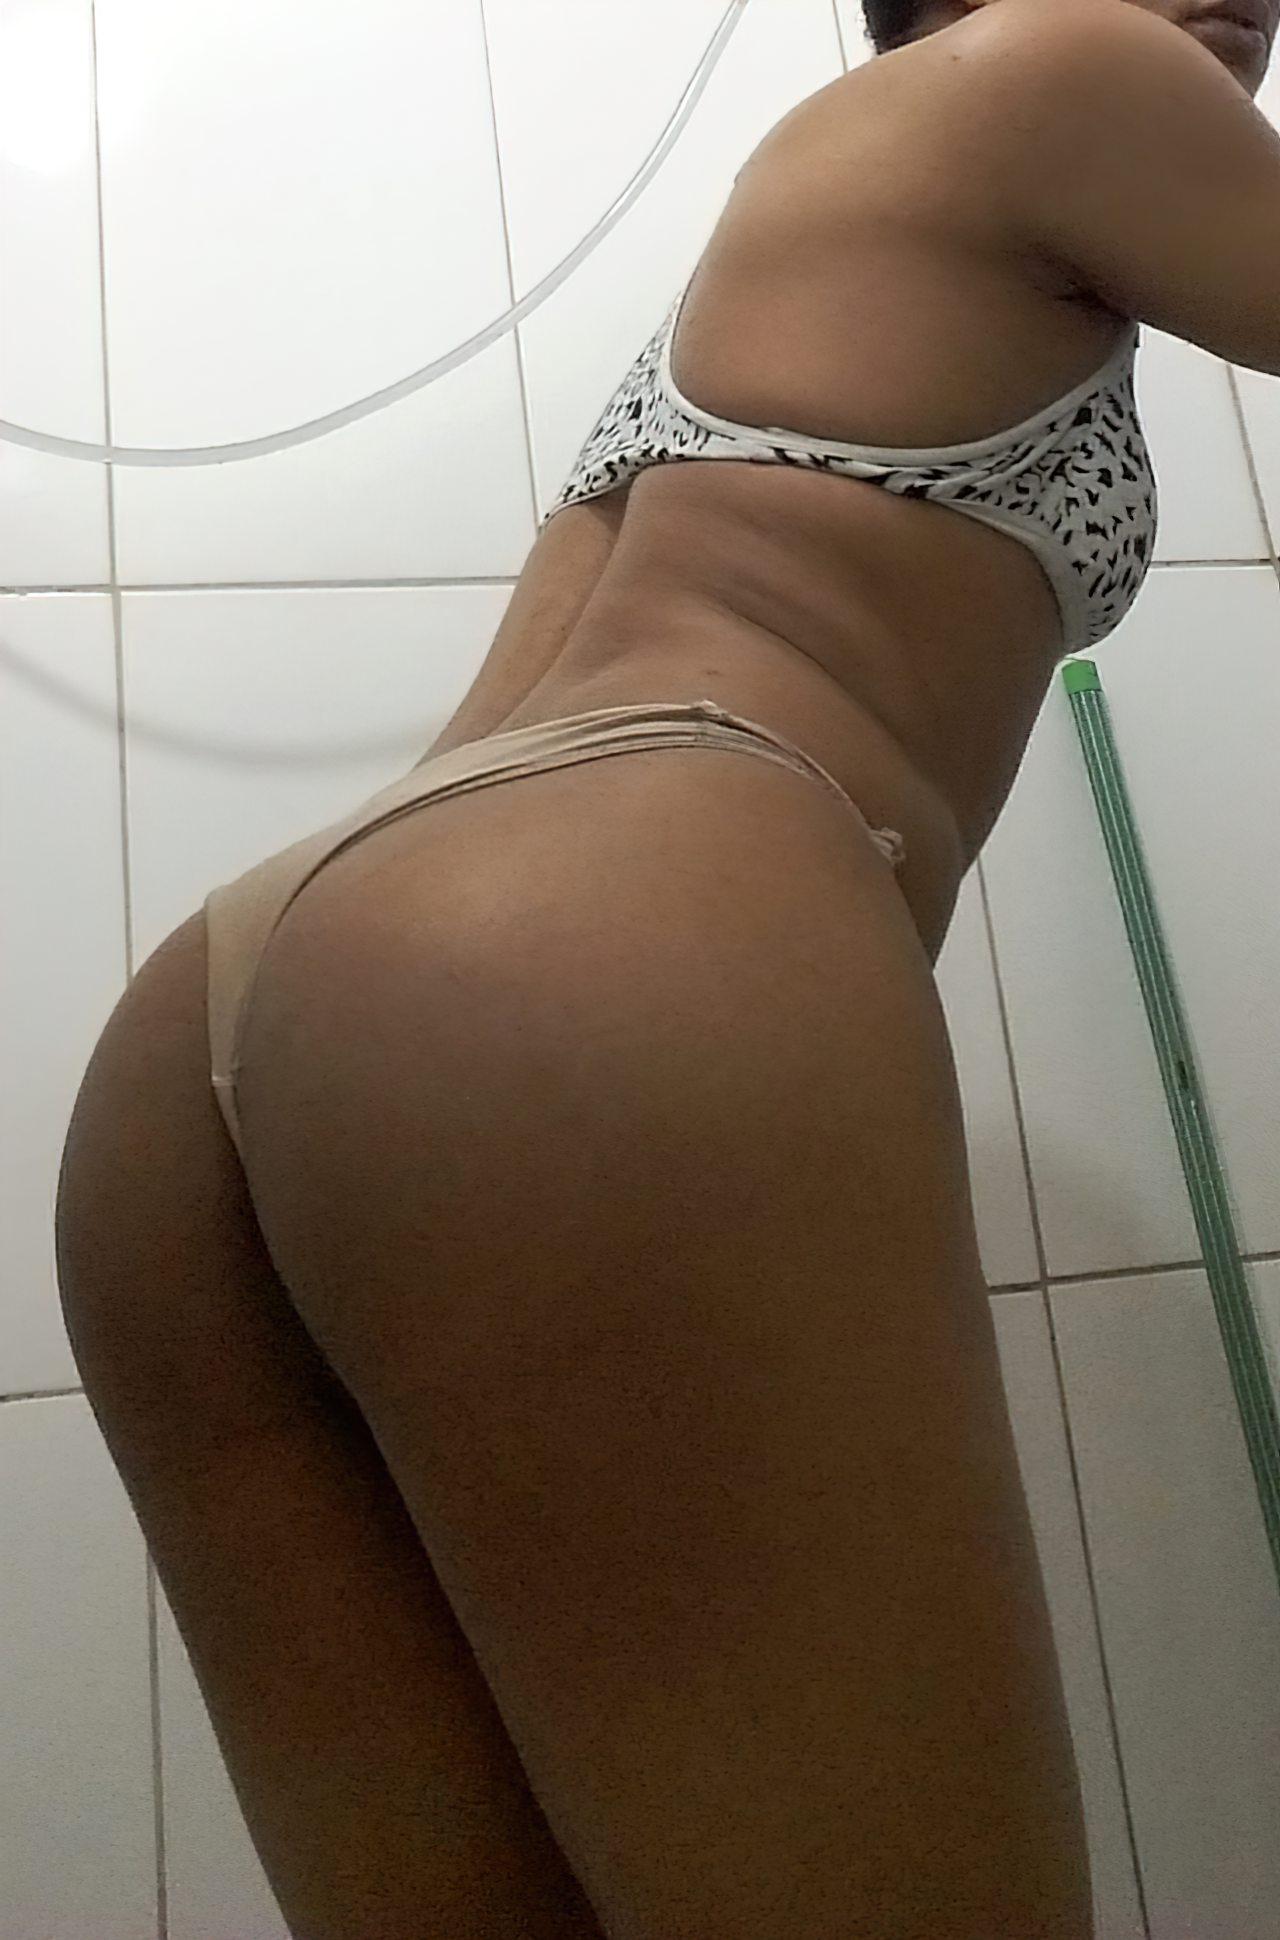 Amadora Safadinha (6)